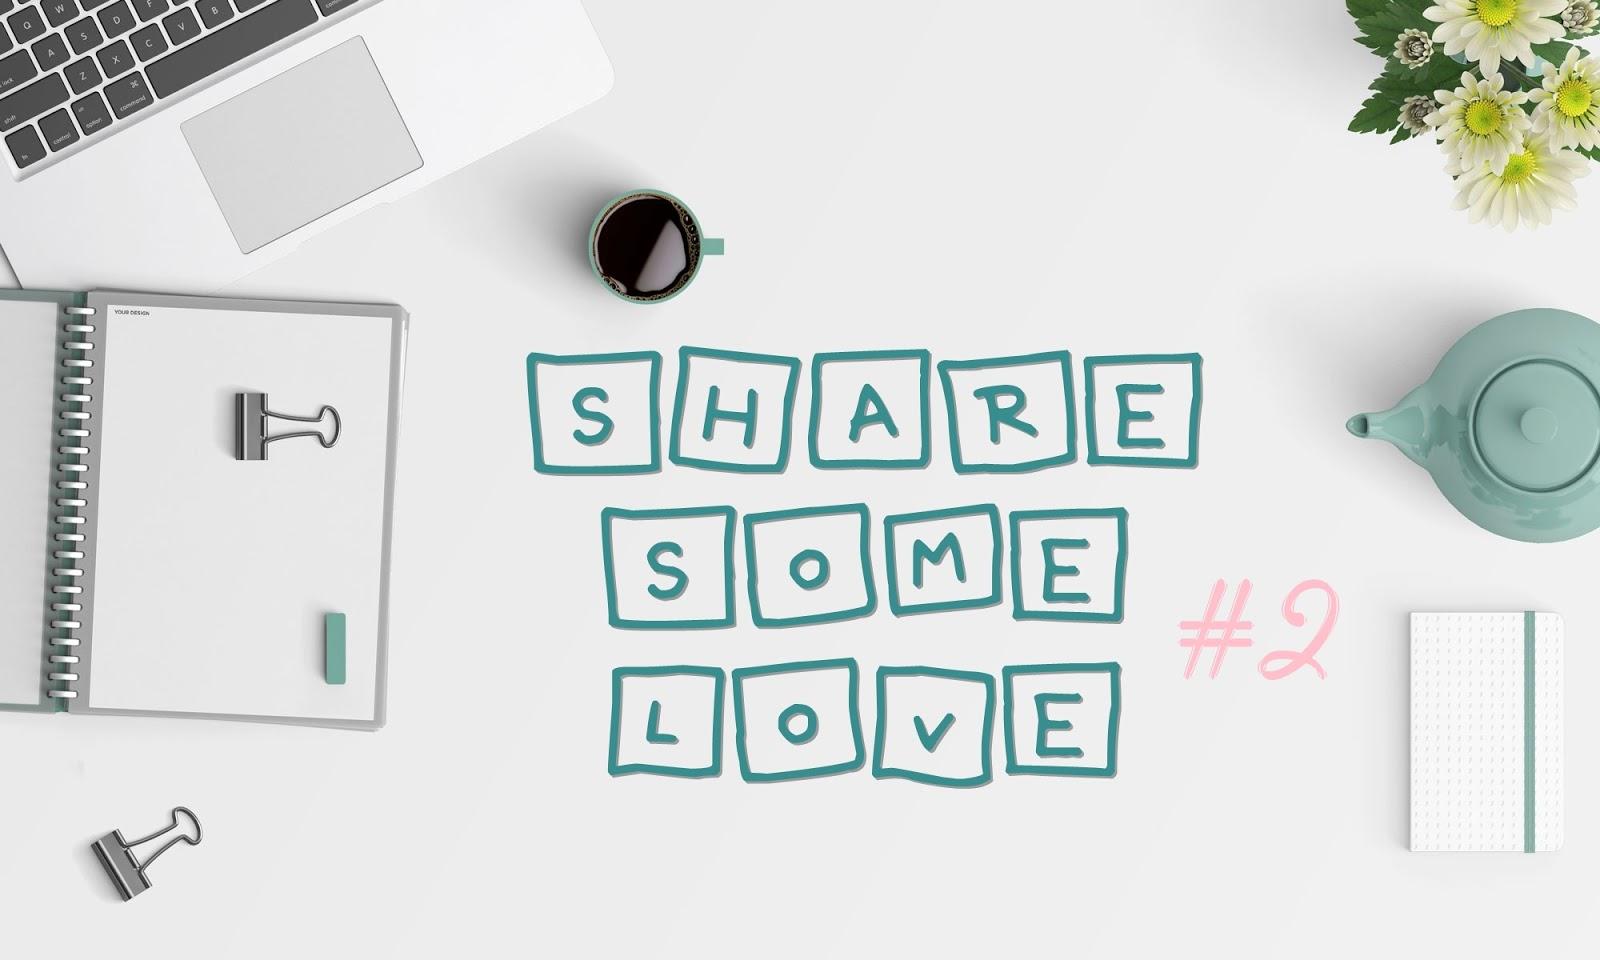 Share Some Love | Włosomaniactwo, Japonia i nauka makijażu